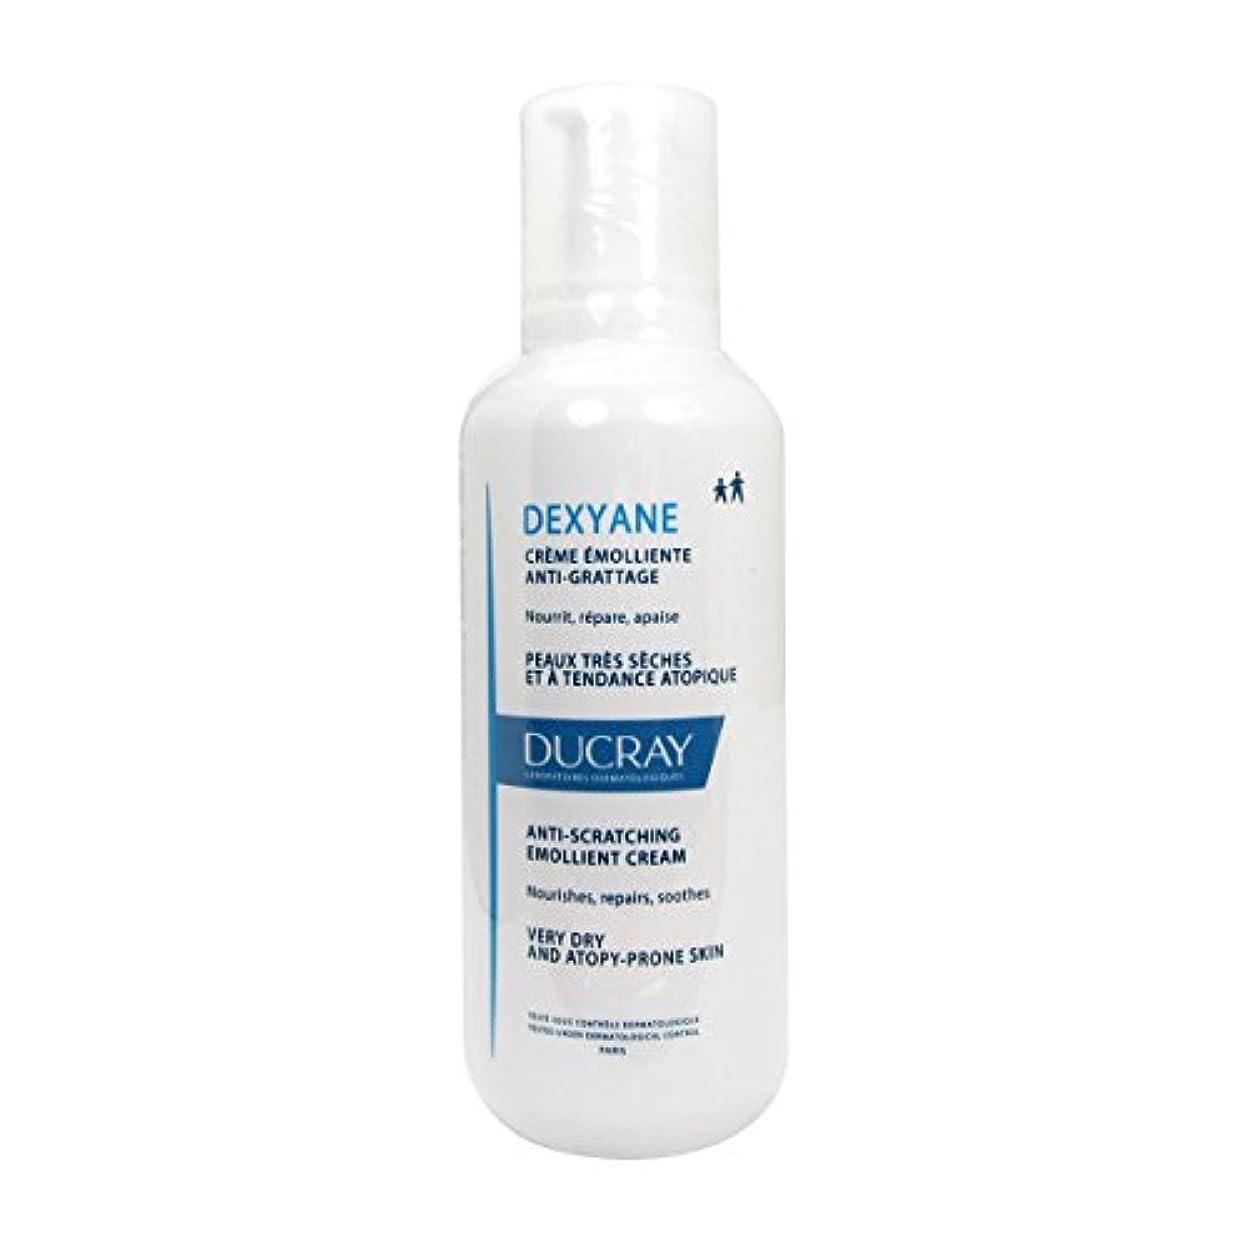 祝福する瞑想路面電車Ducray Dexyane Anti-scratching Emollient Cream 400ml [並行輸入品]